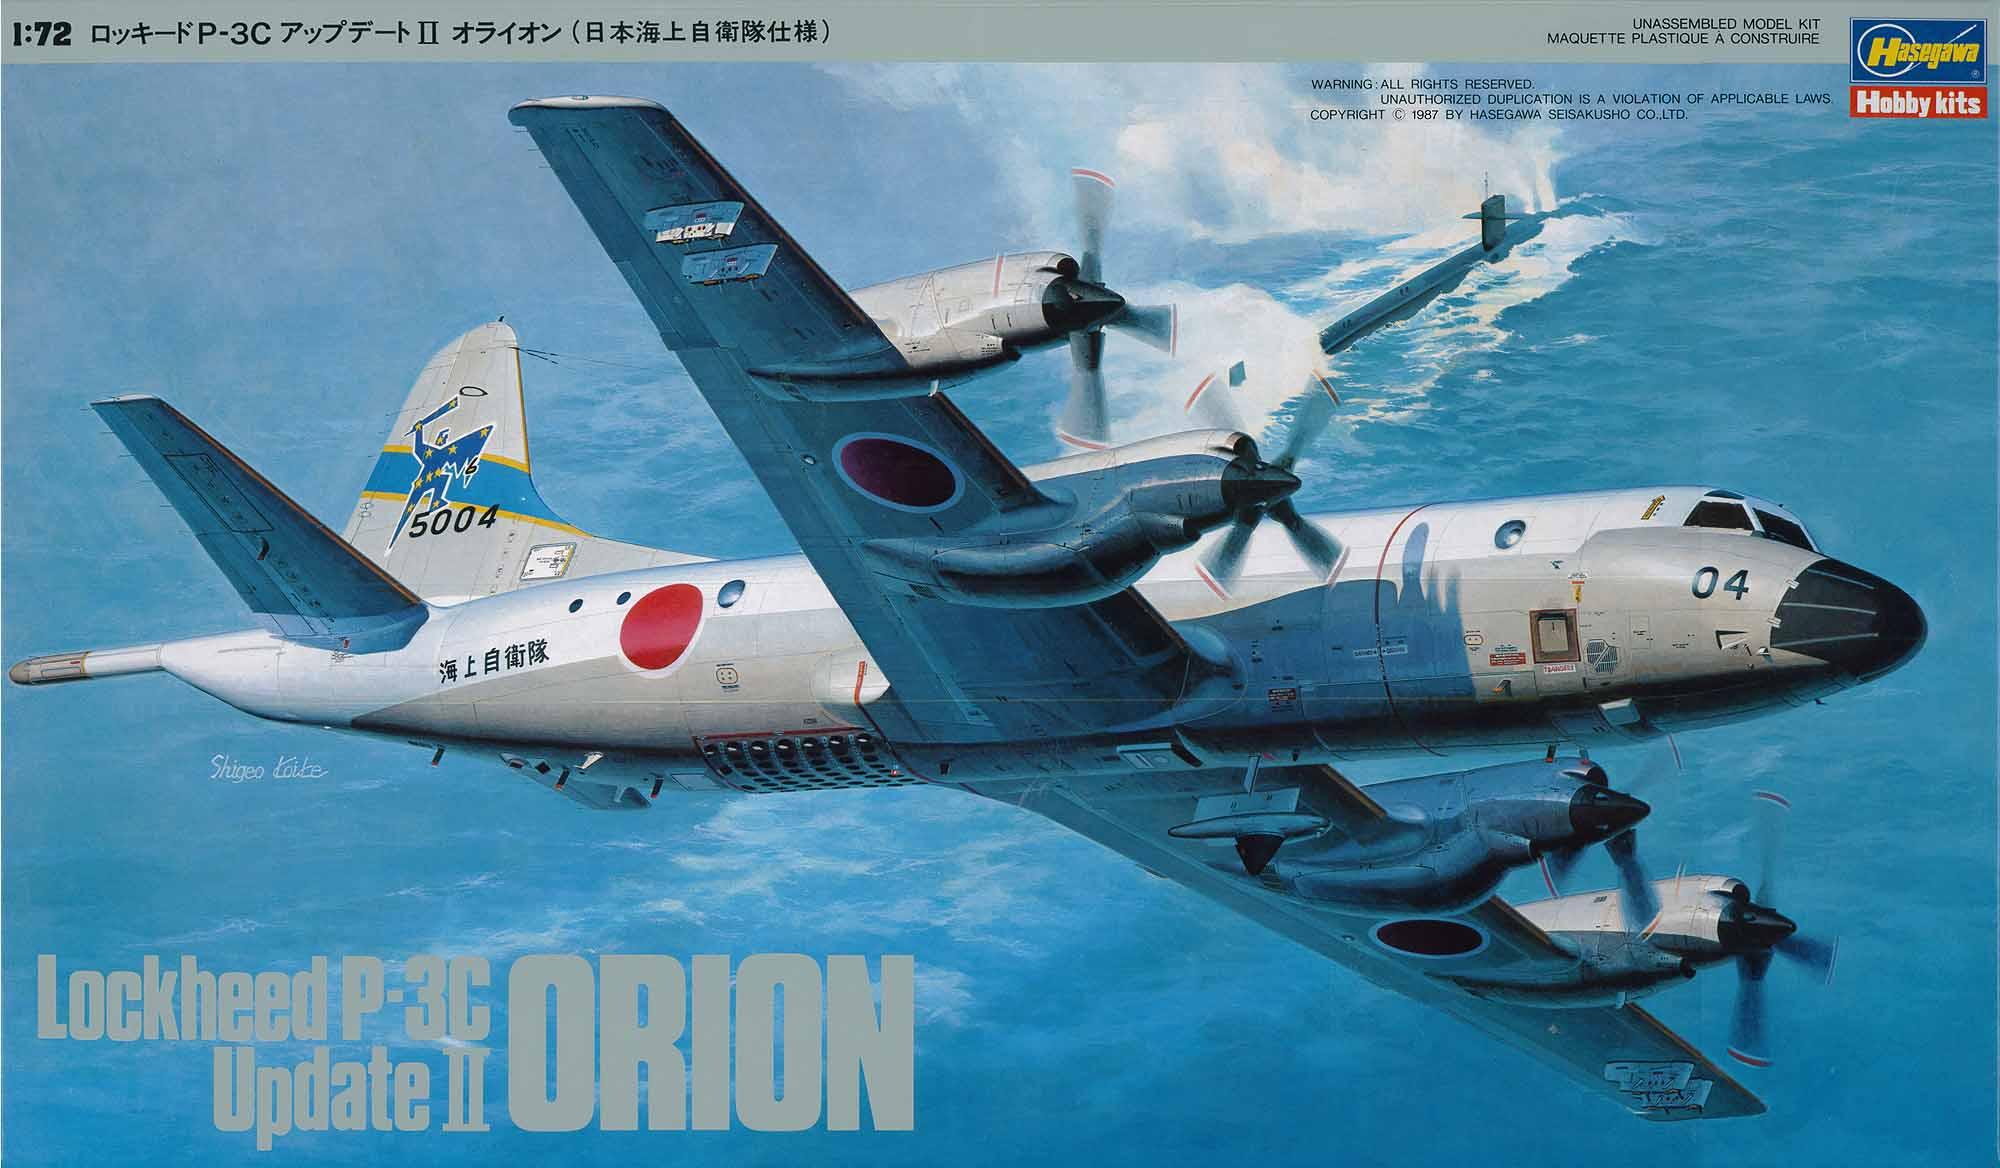 "Hasegawa 1/72 P-3C UPDATE II ORION ""J.M.S.D.F."" K15X"